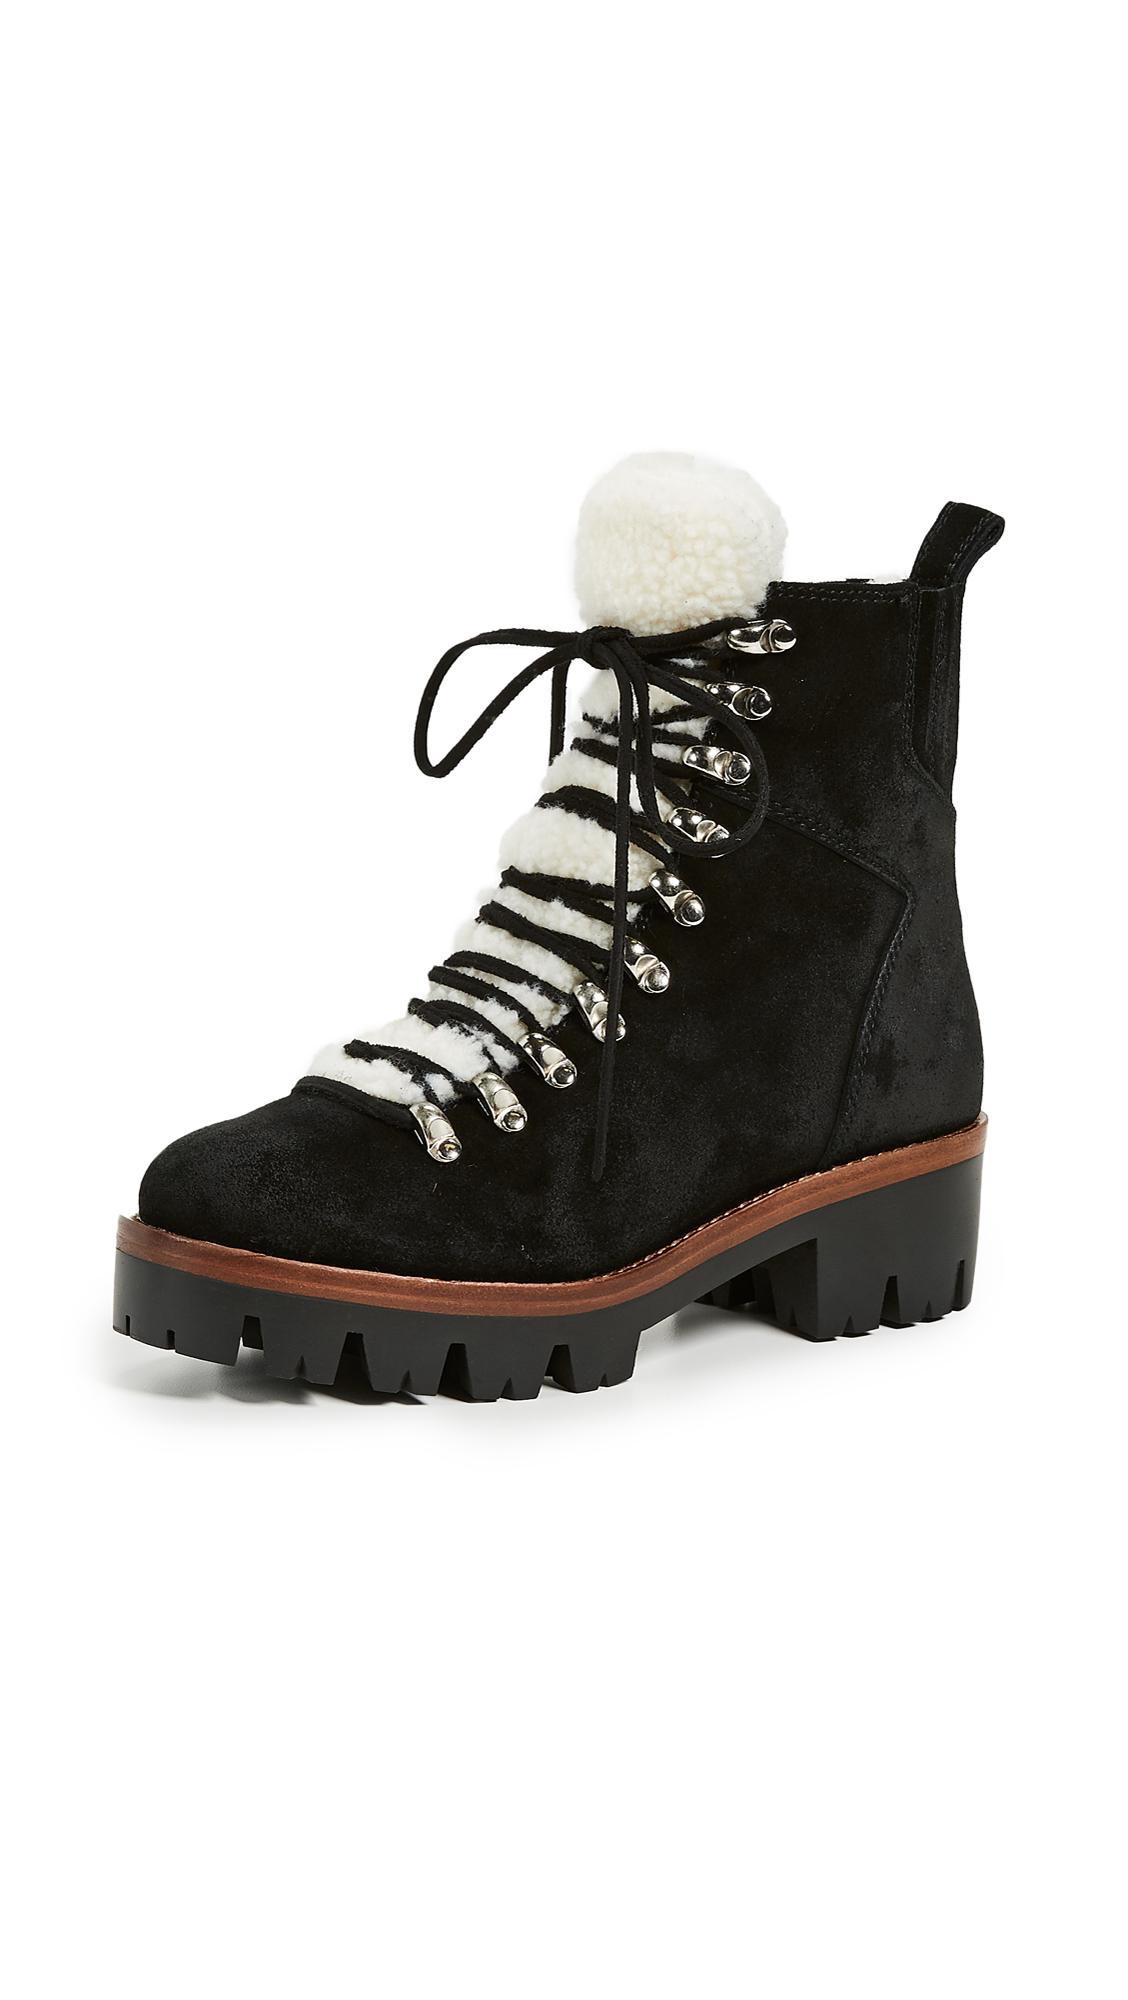 Jeffrey Campbell Culvert Sherpa Combat Boots - Black